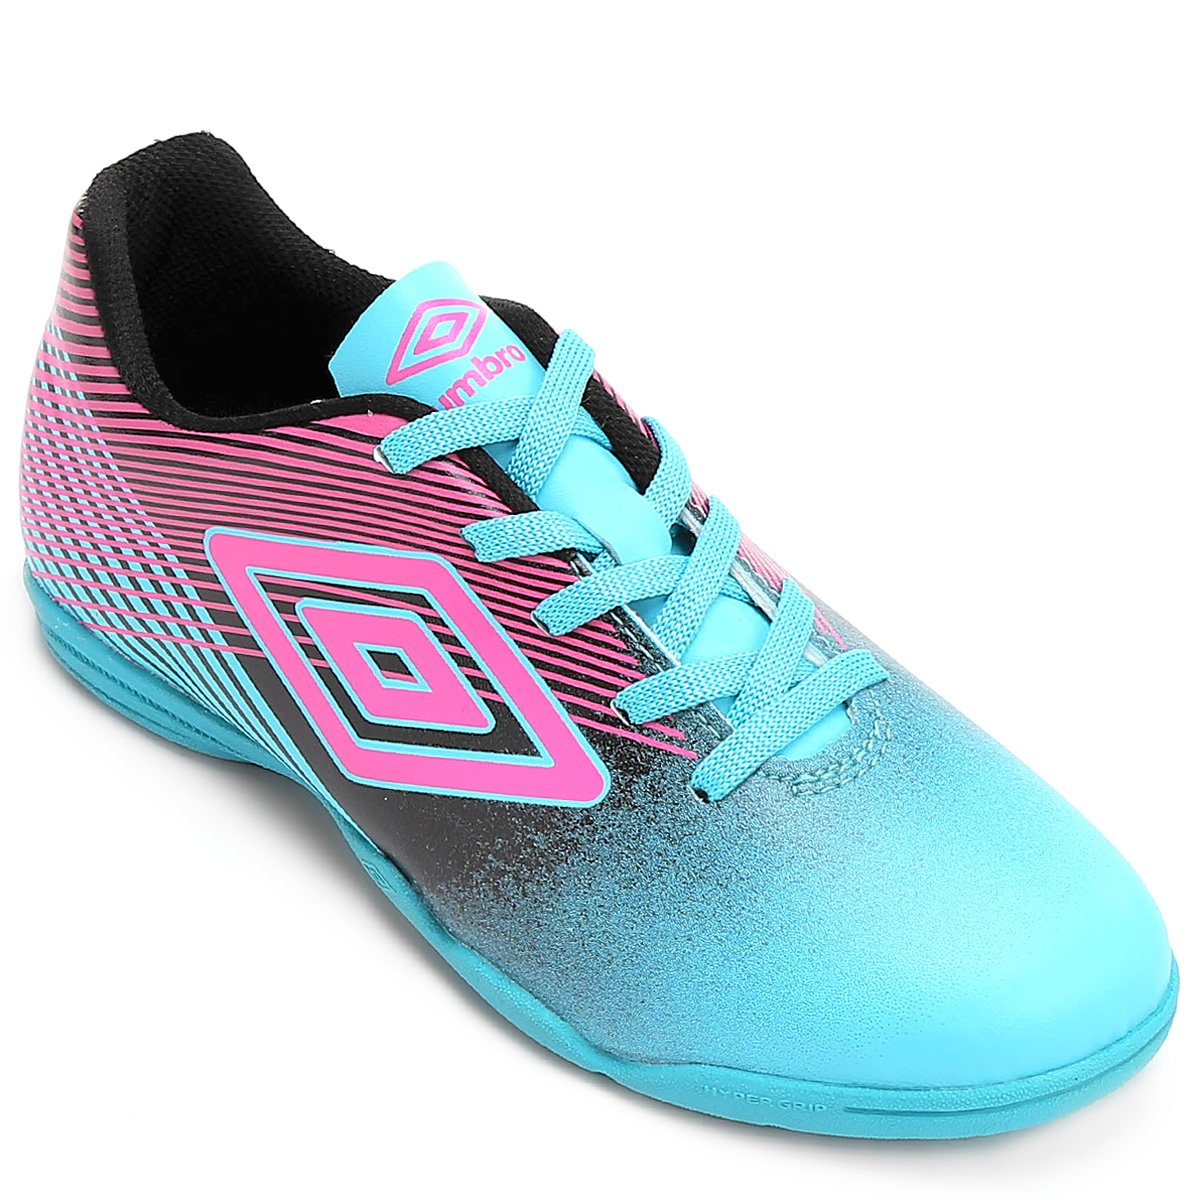 2151b8eee2c8f Chuteira Futsal Infantil Umbro Slice 3 - Compre Agora